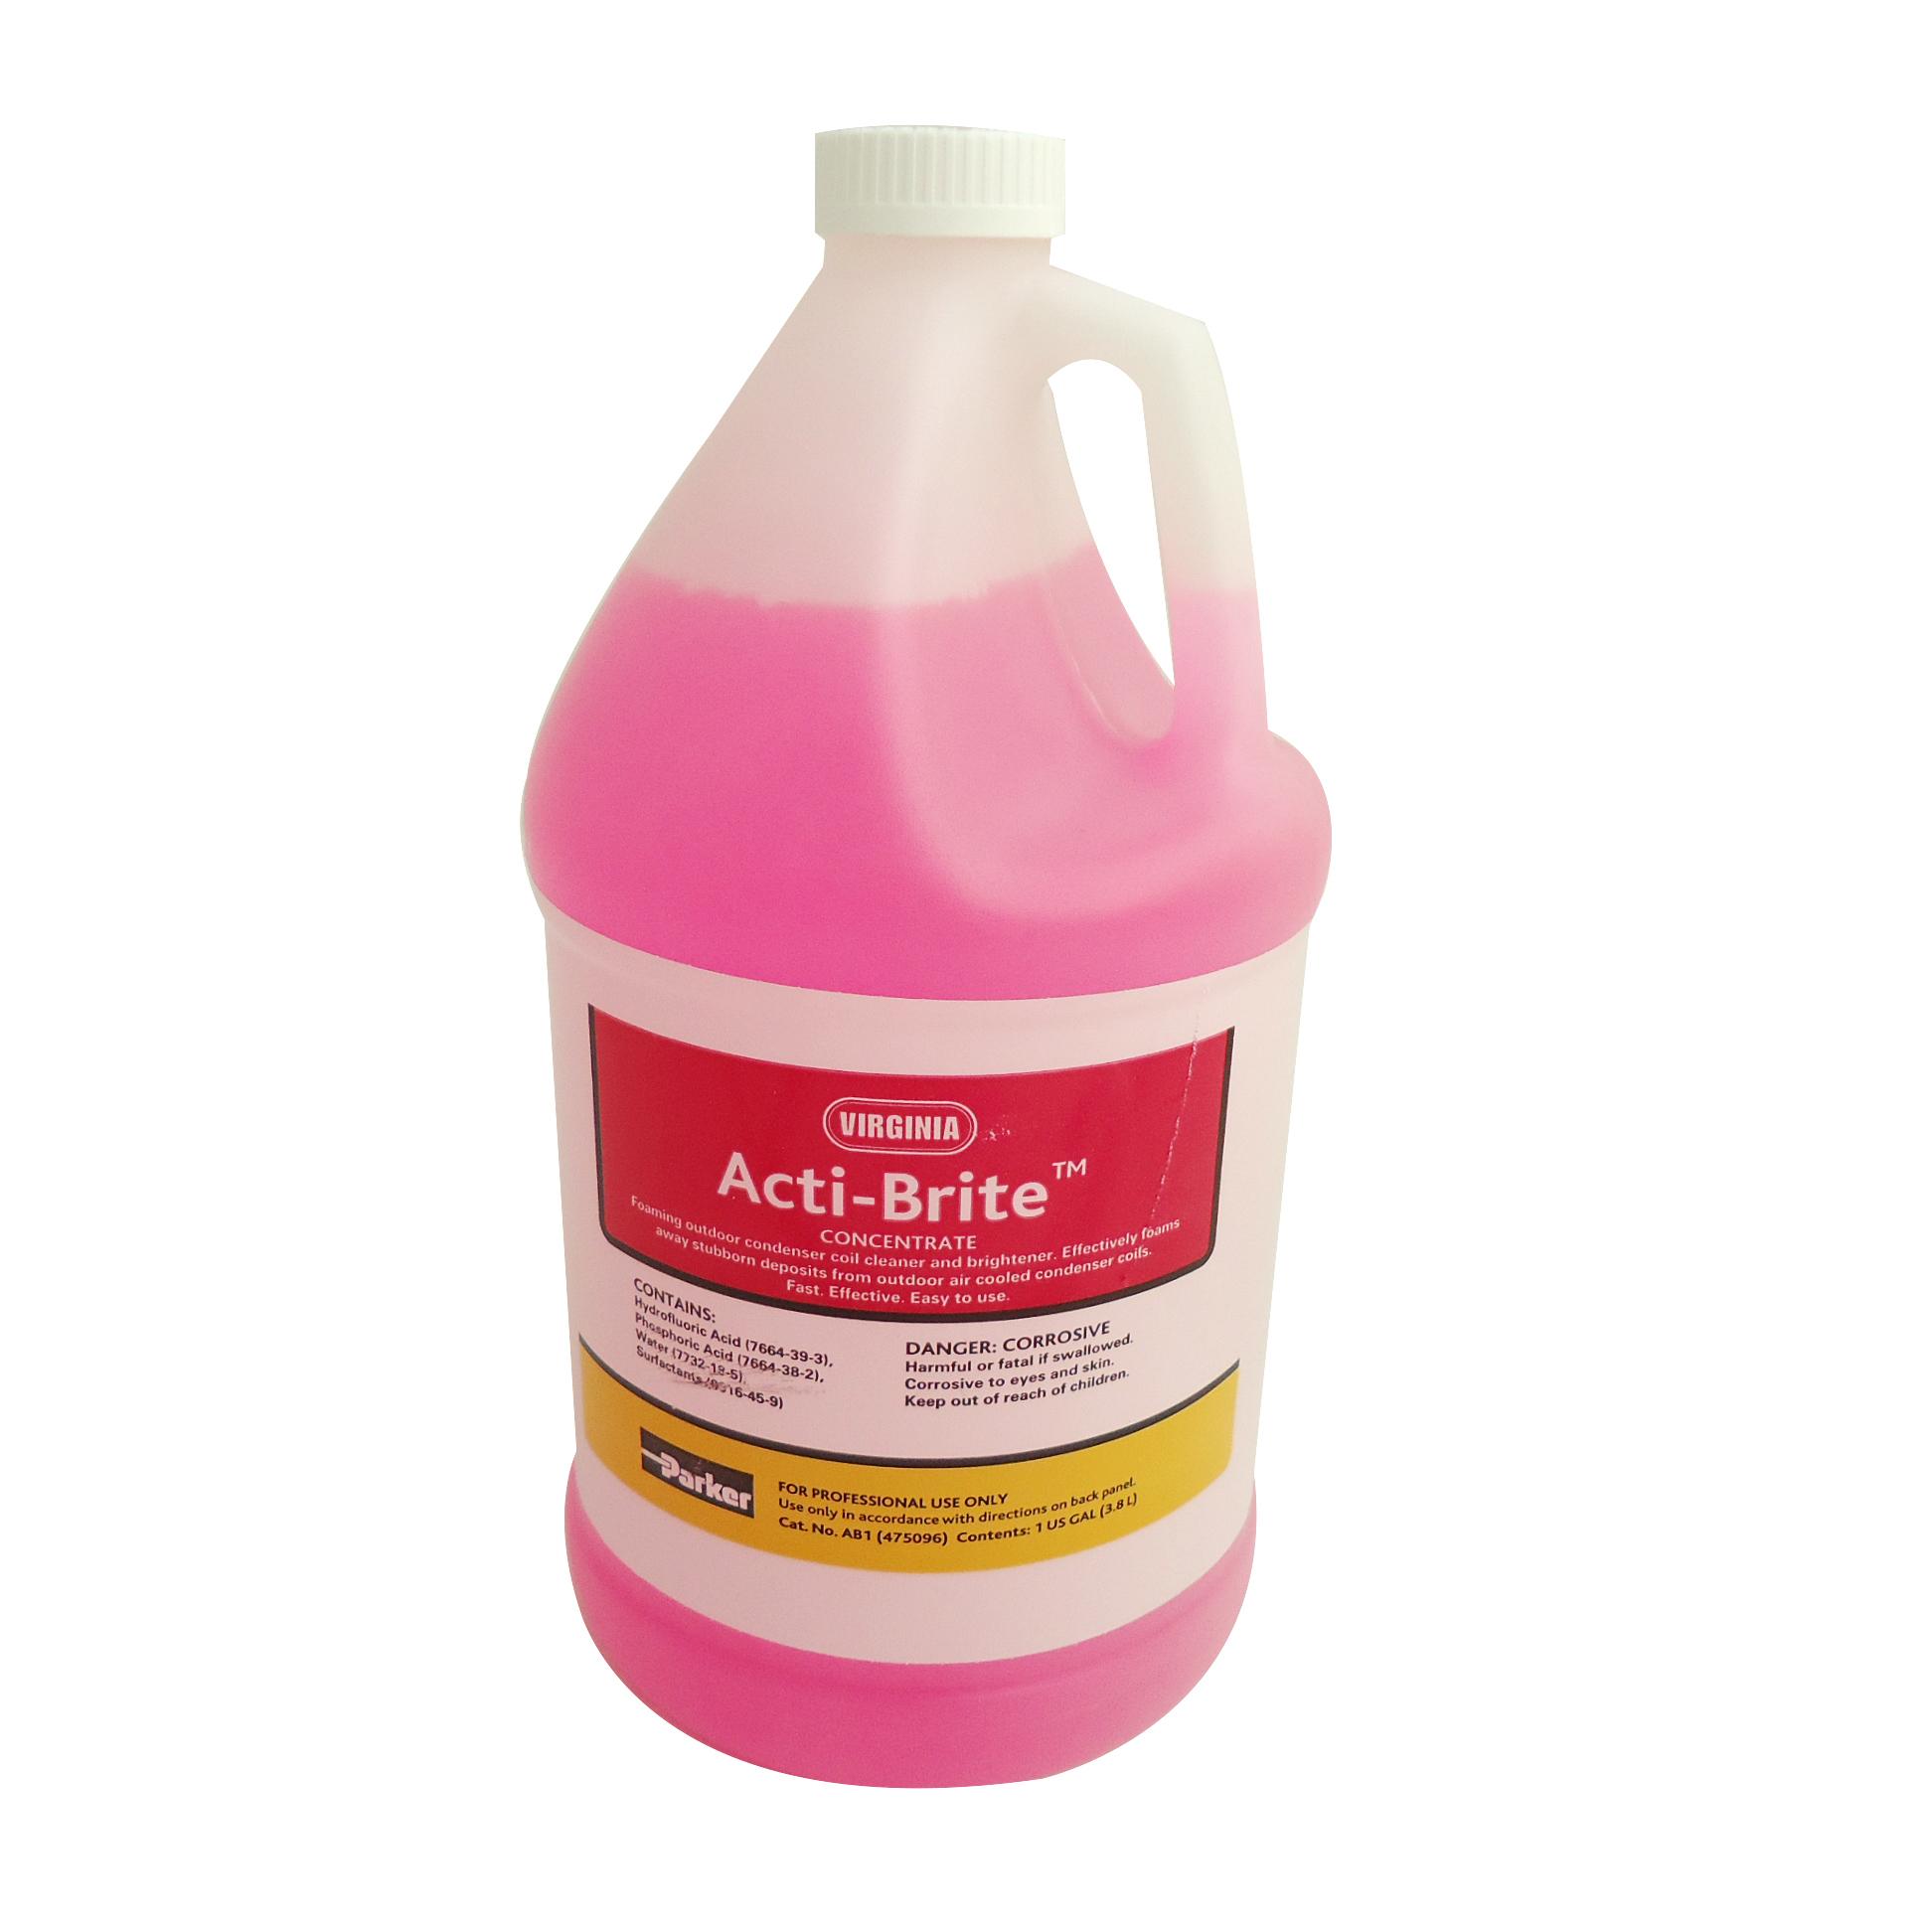 Parker - Virginia Acti Brite AB1 (475096) Καθαριστικό Εξωτερικής Χρήσης Για Κλιμ κλιματισμός    καθαριστικά κλιματιστικών a c  προσφορές   κλιματισμός   υλικά εγ